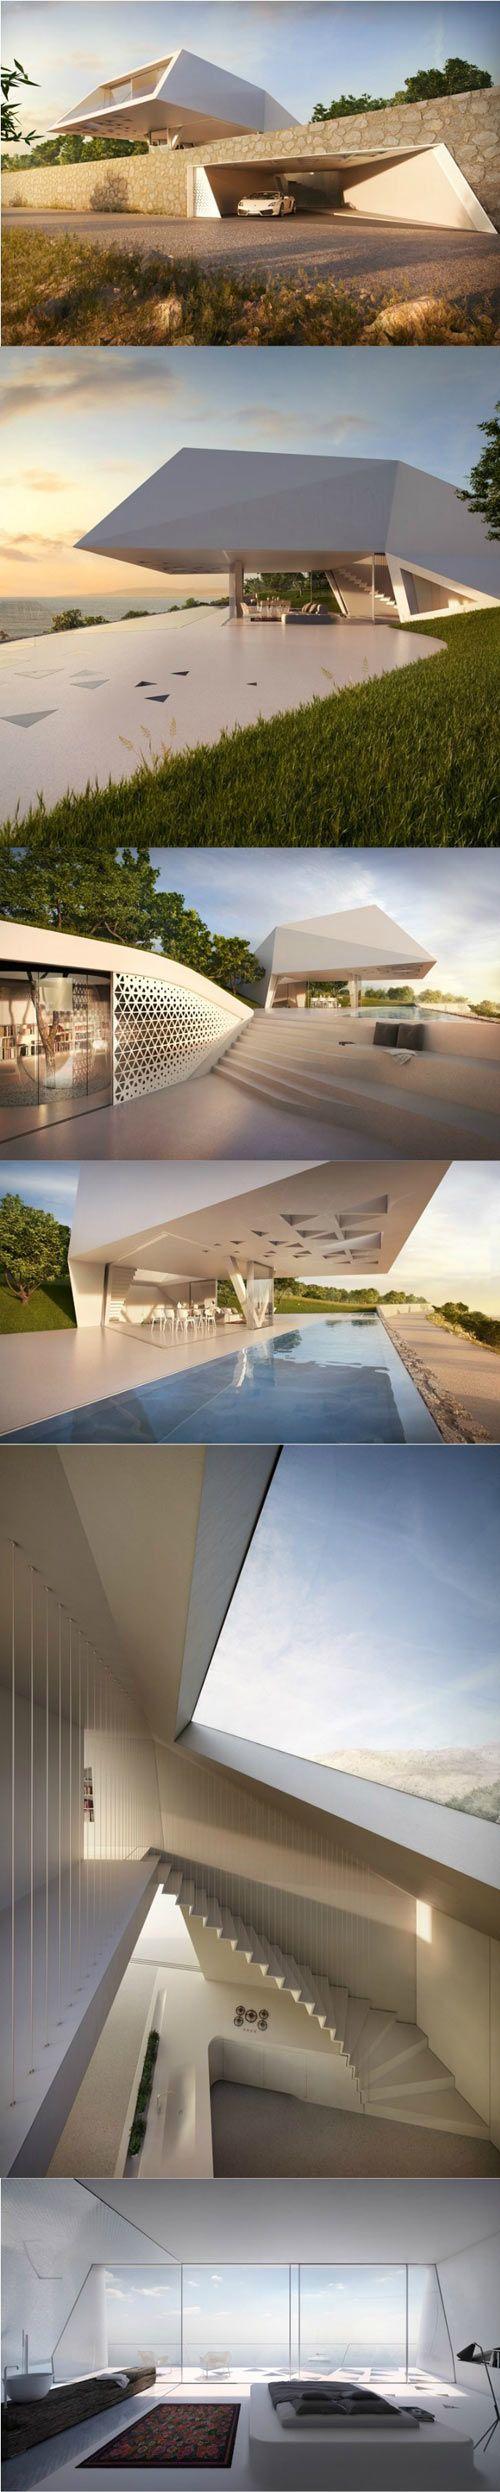 Villa F in Rhodes, Greece, by Peter Thomas Hornung, Elsa Katharina Jacobi and Jan Escher